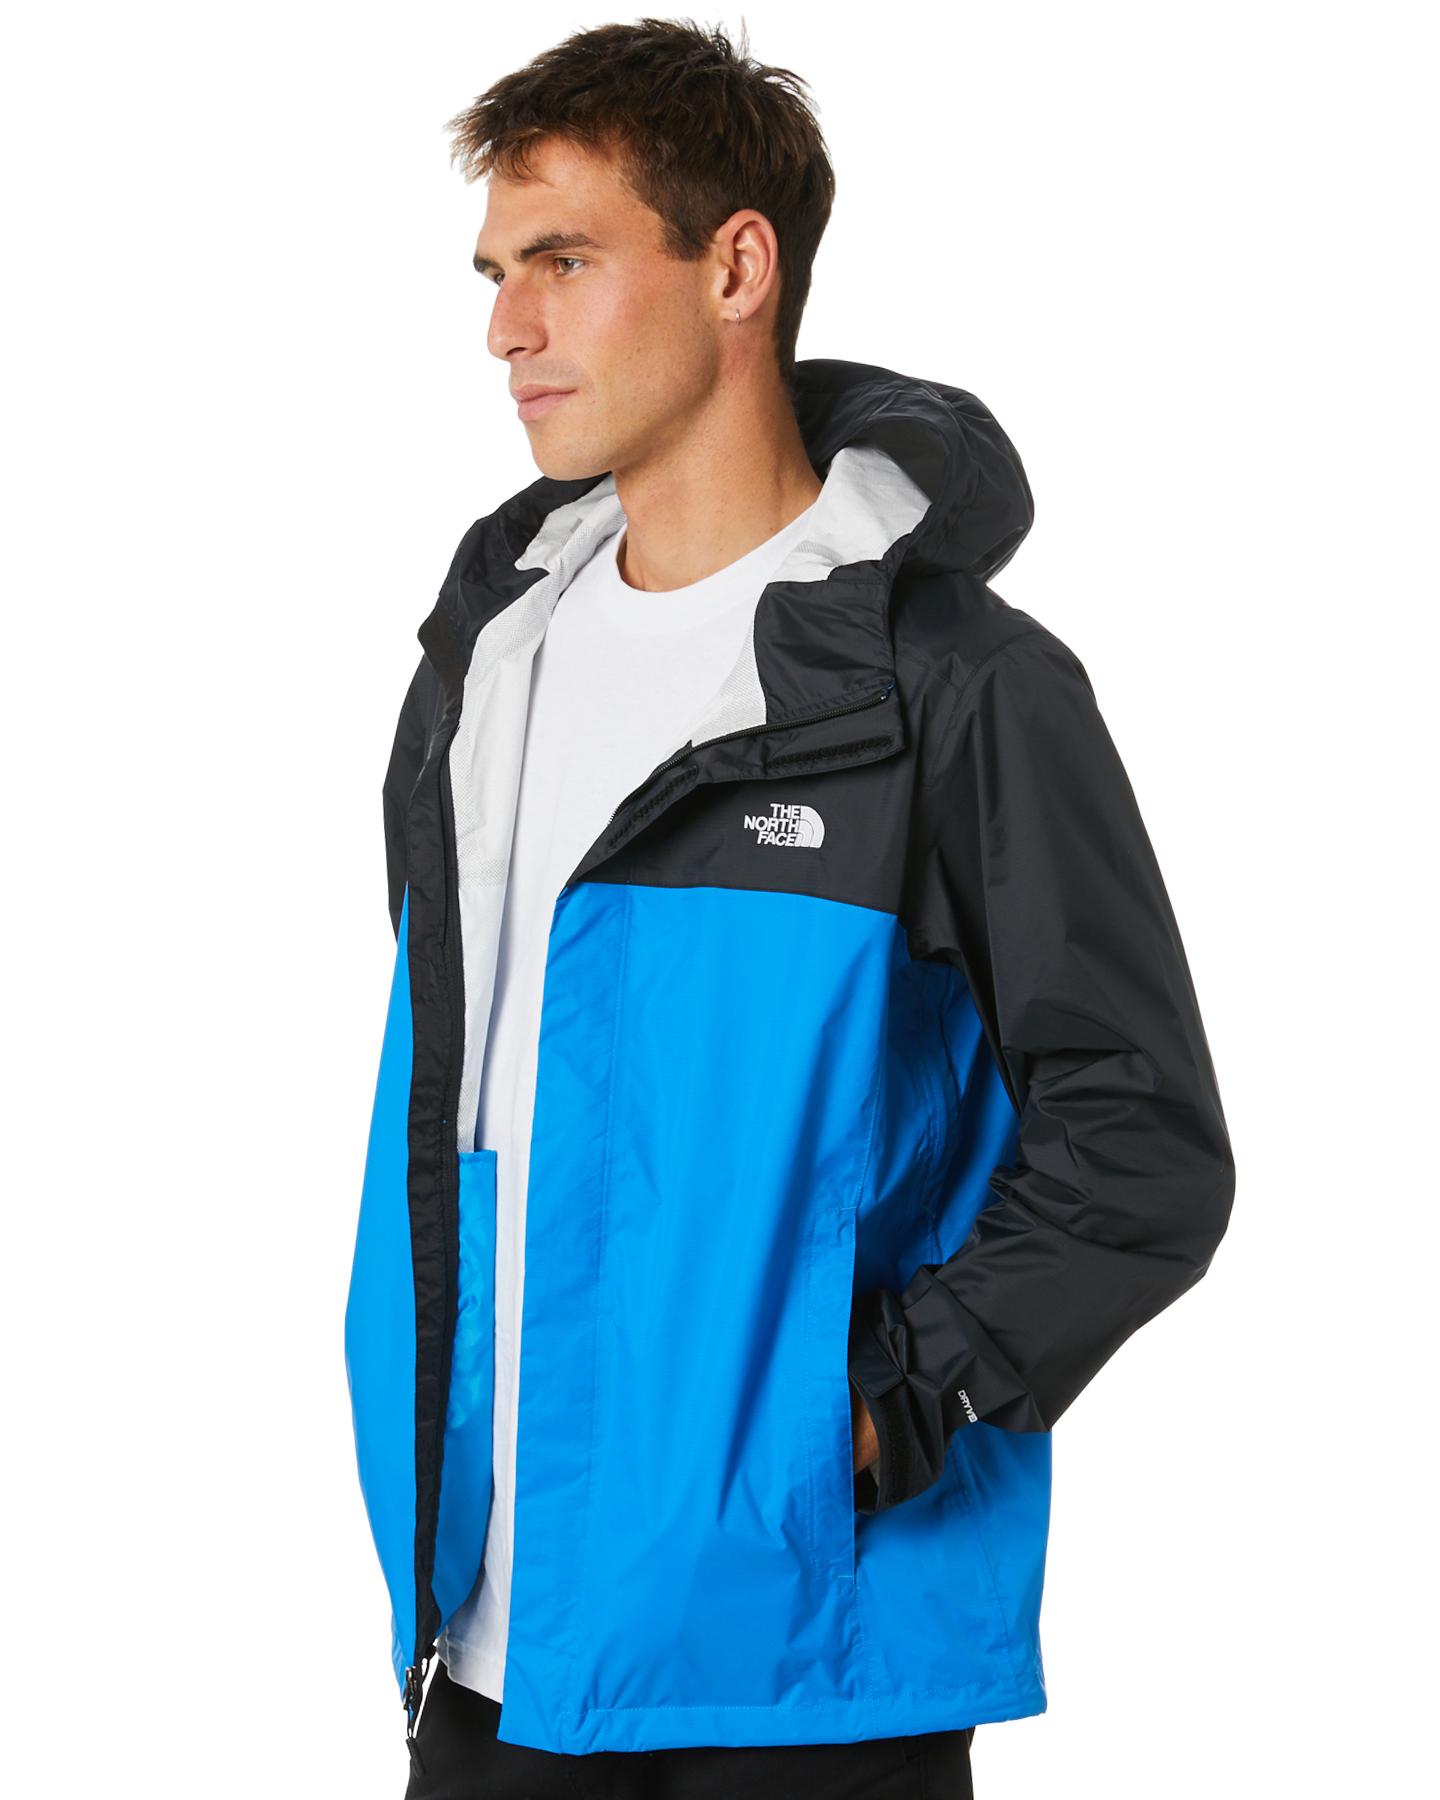 M Venture 2 Jacket